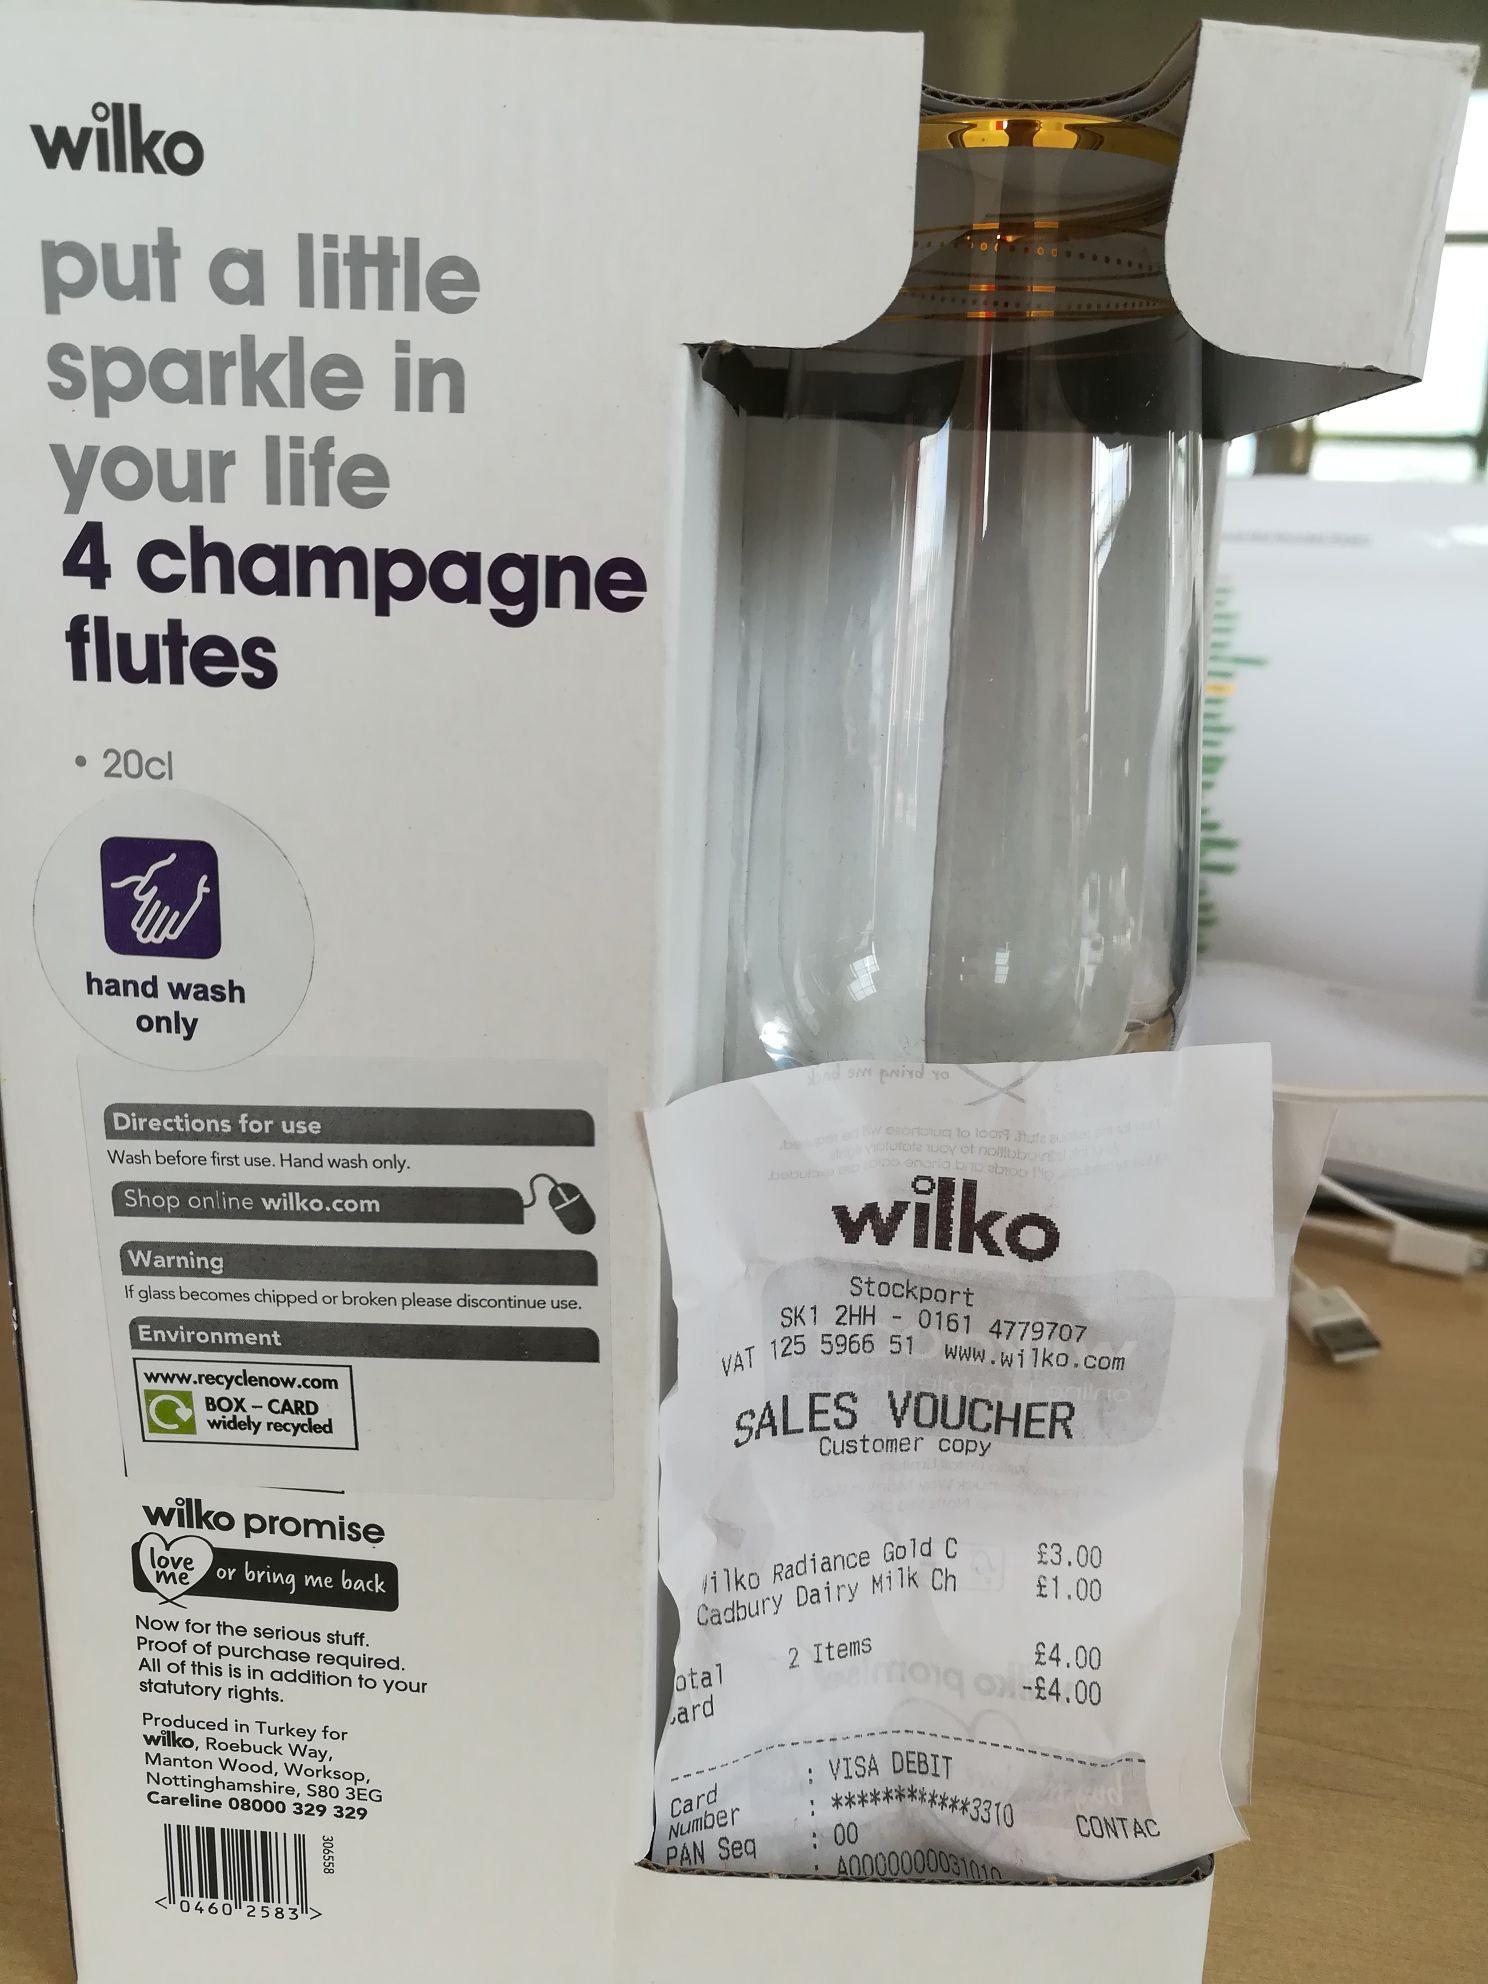 Champagne/lambrini flutes £3 for 4 @ wilko - Stockport